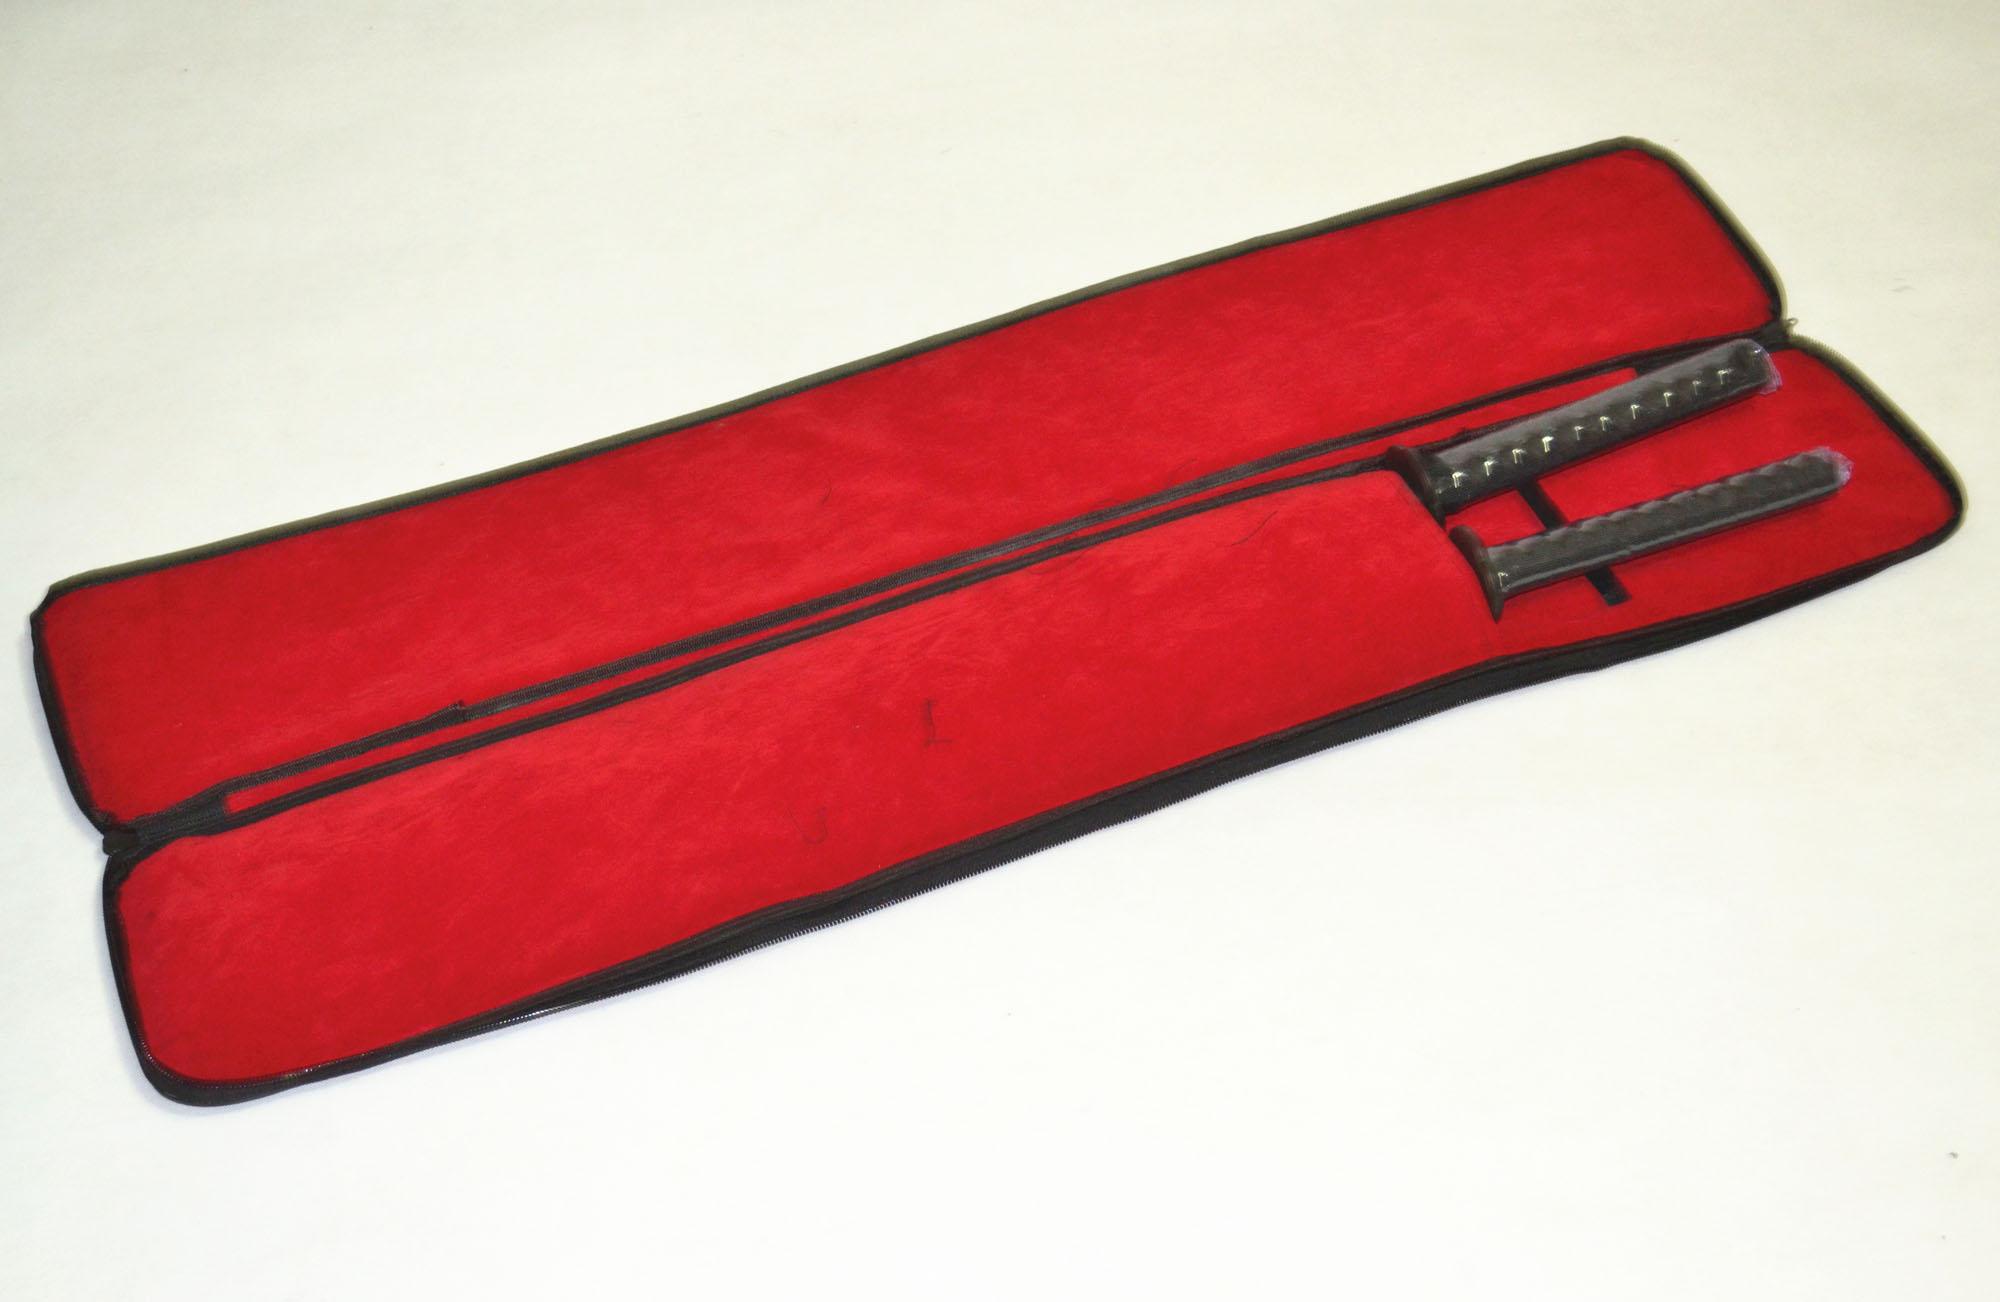 Buy Japan Kendo Aikido Japan  knife bags  High quality Double katana sword bag Sword Bag - Sword Carrying Case Sword master cheap